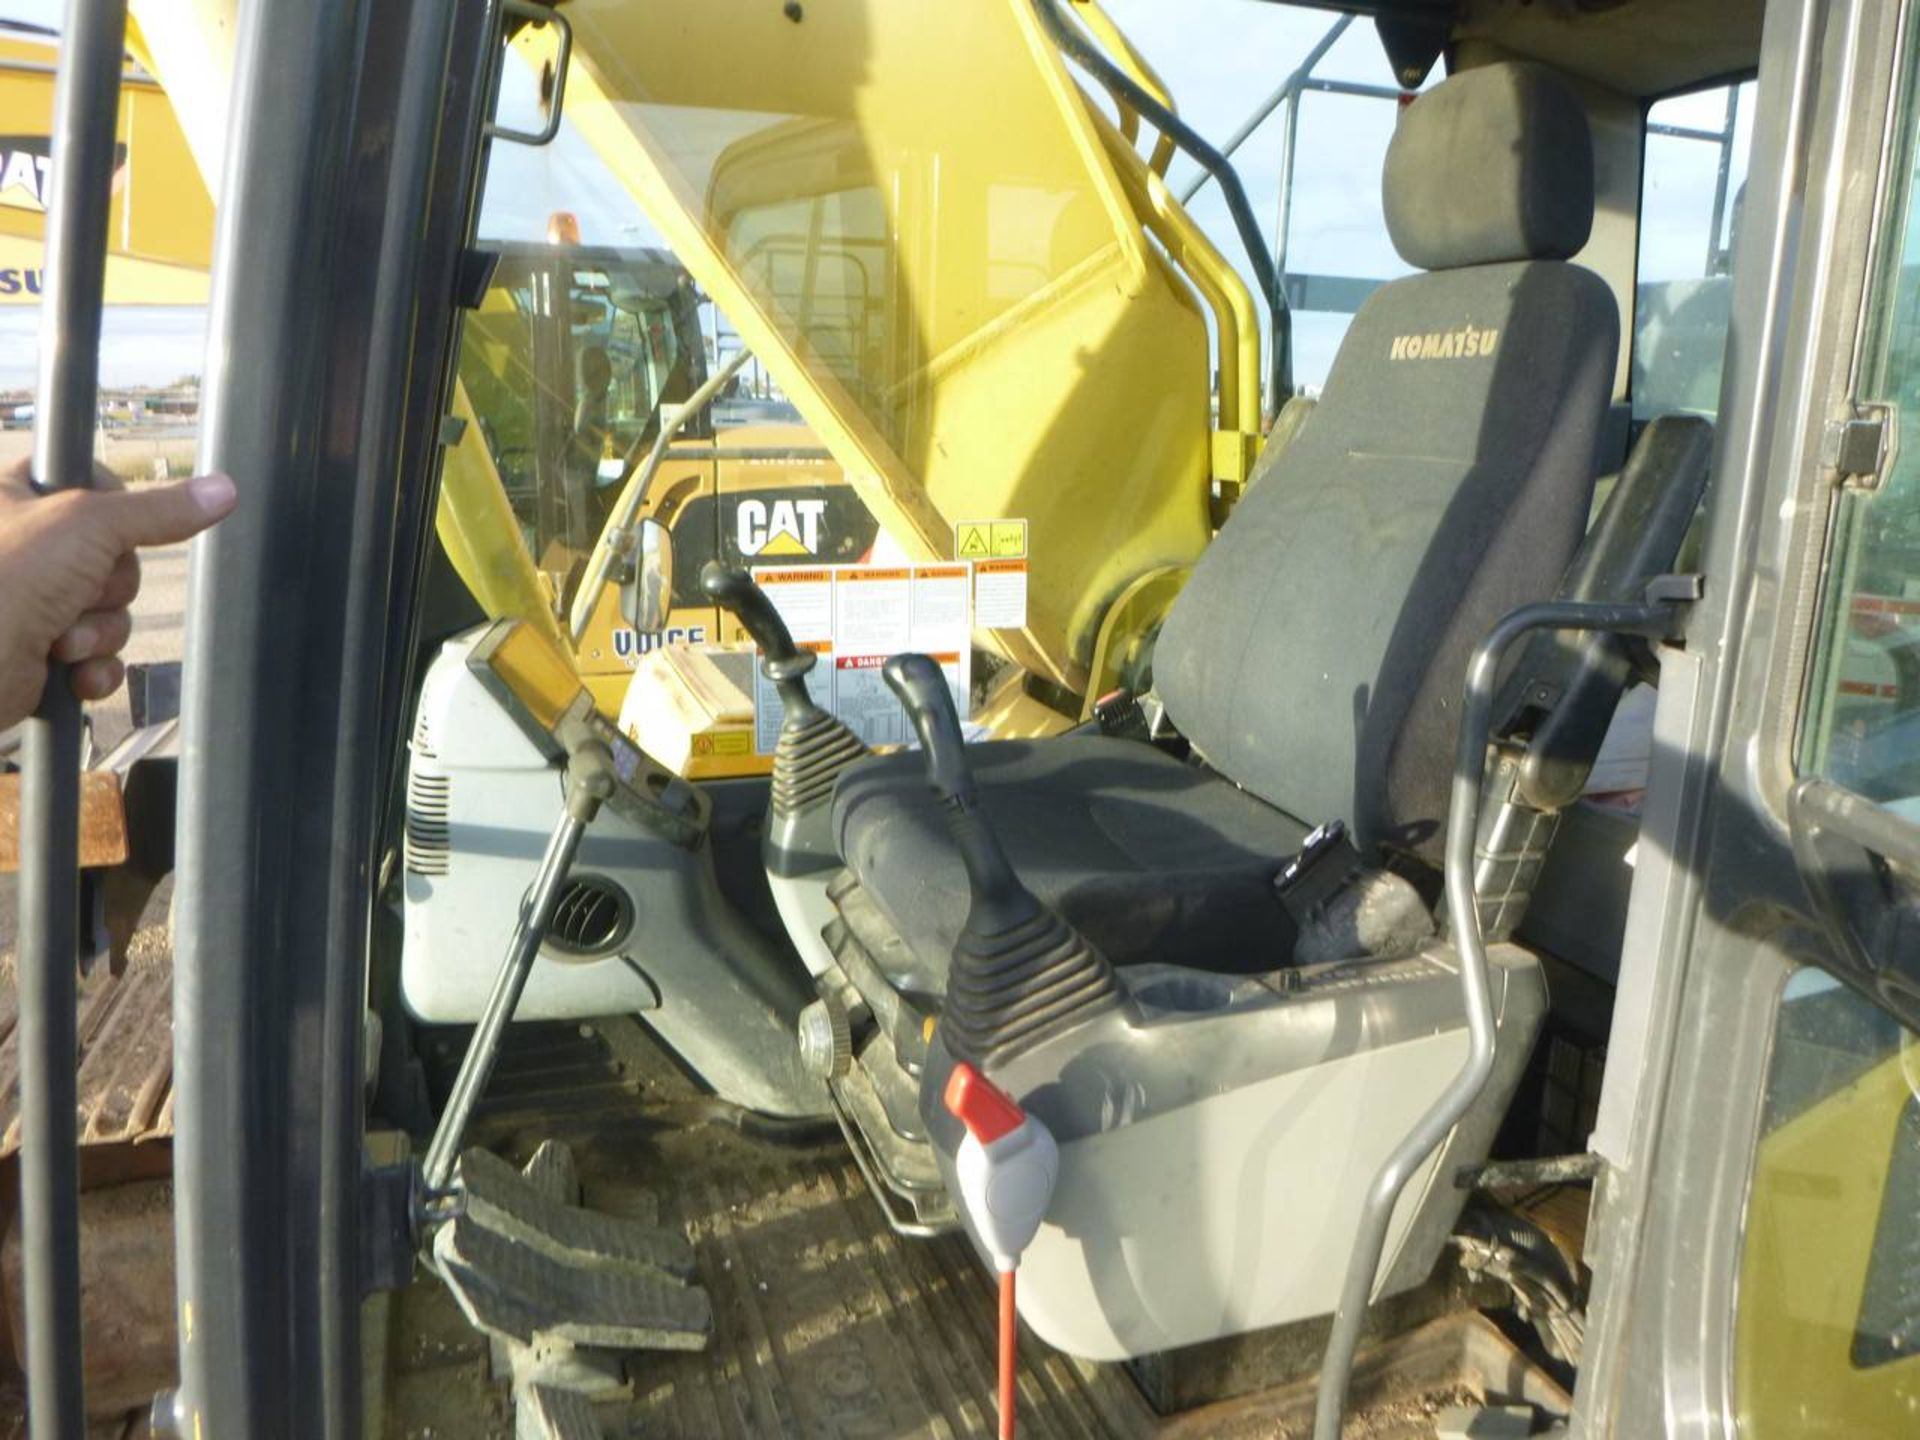 2008 Komatsu PC400LC-8 Excavator - Image 10 of 13